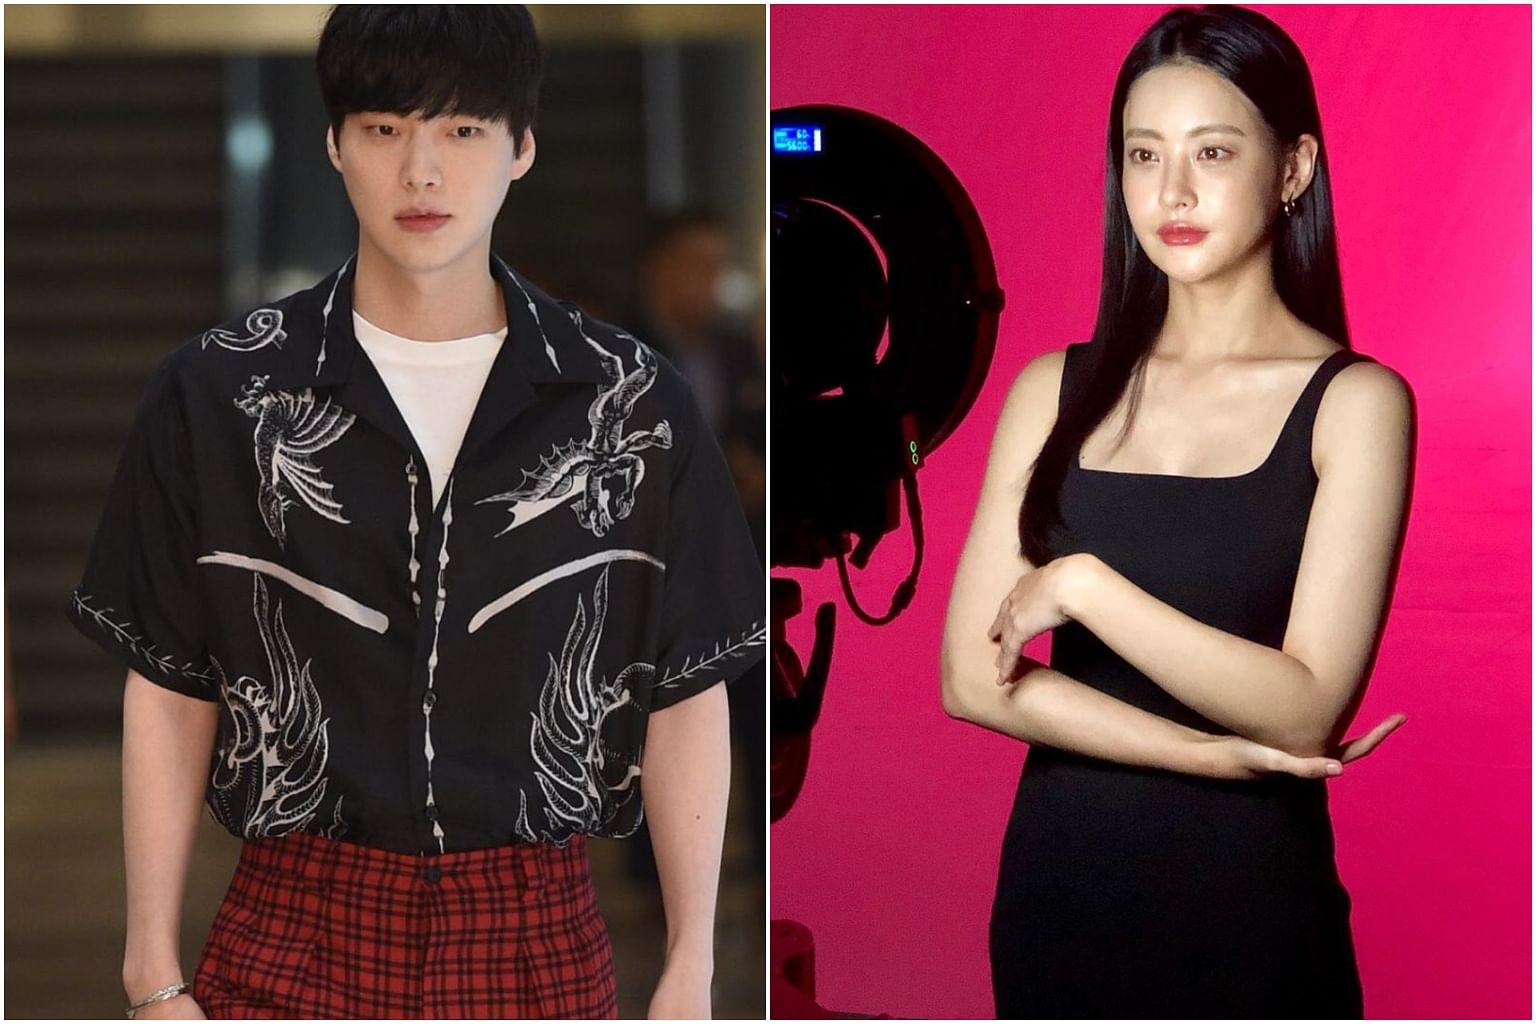 Goo hye sun dating edward norton dating